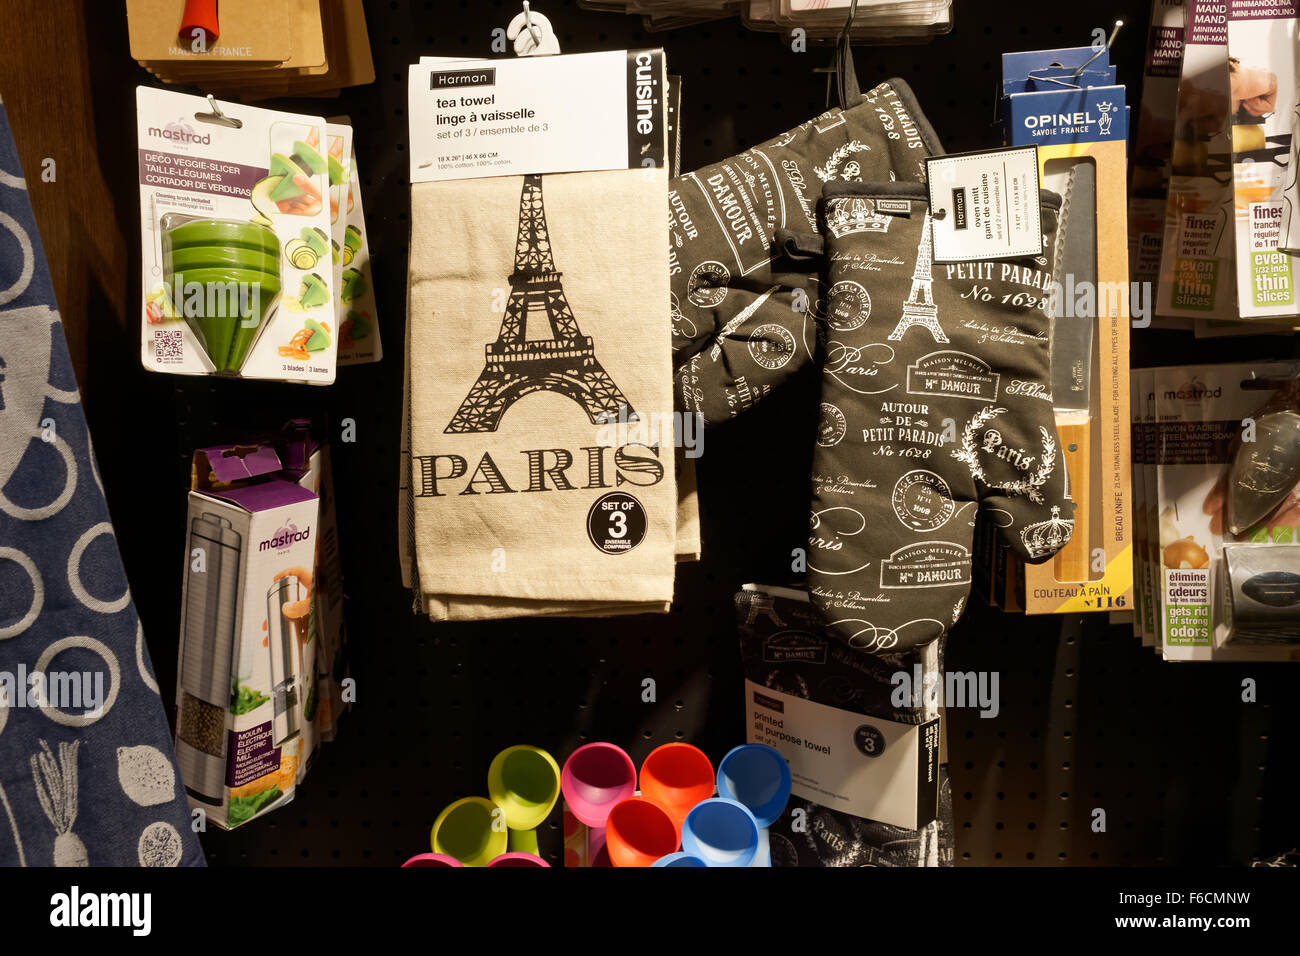 Towels Sale Stockfotos & Towels Sale Bilder - Alamy